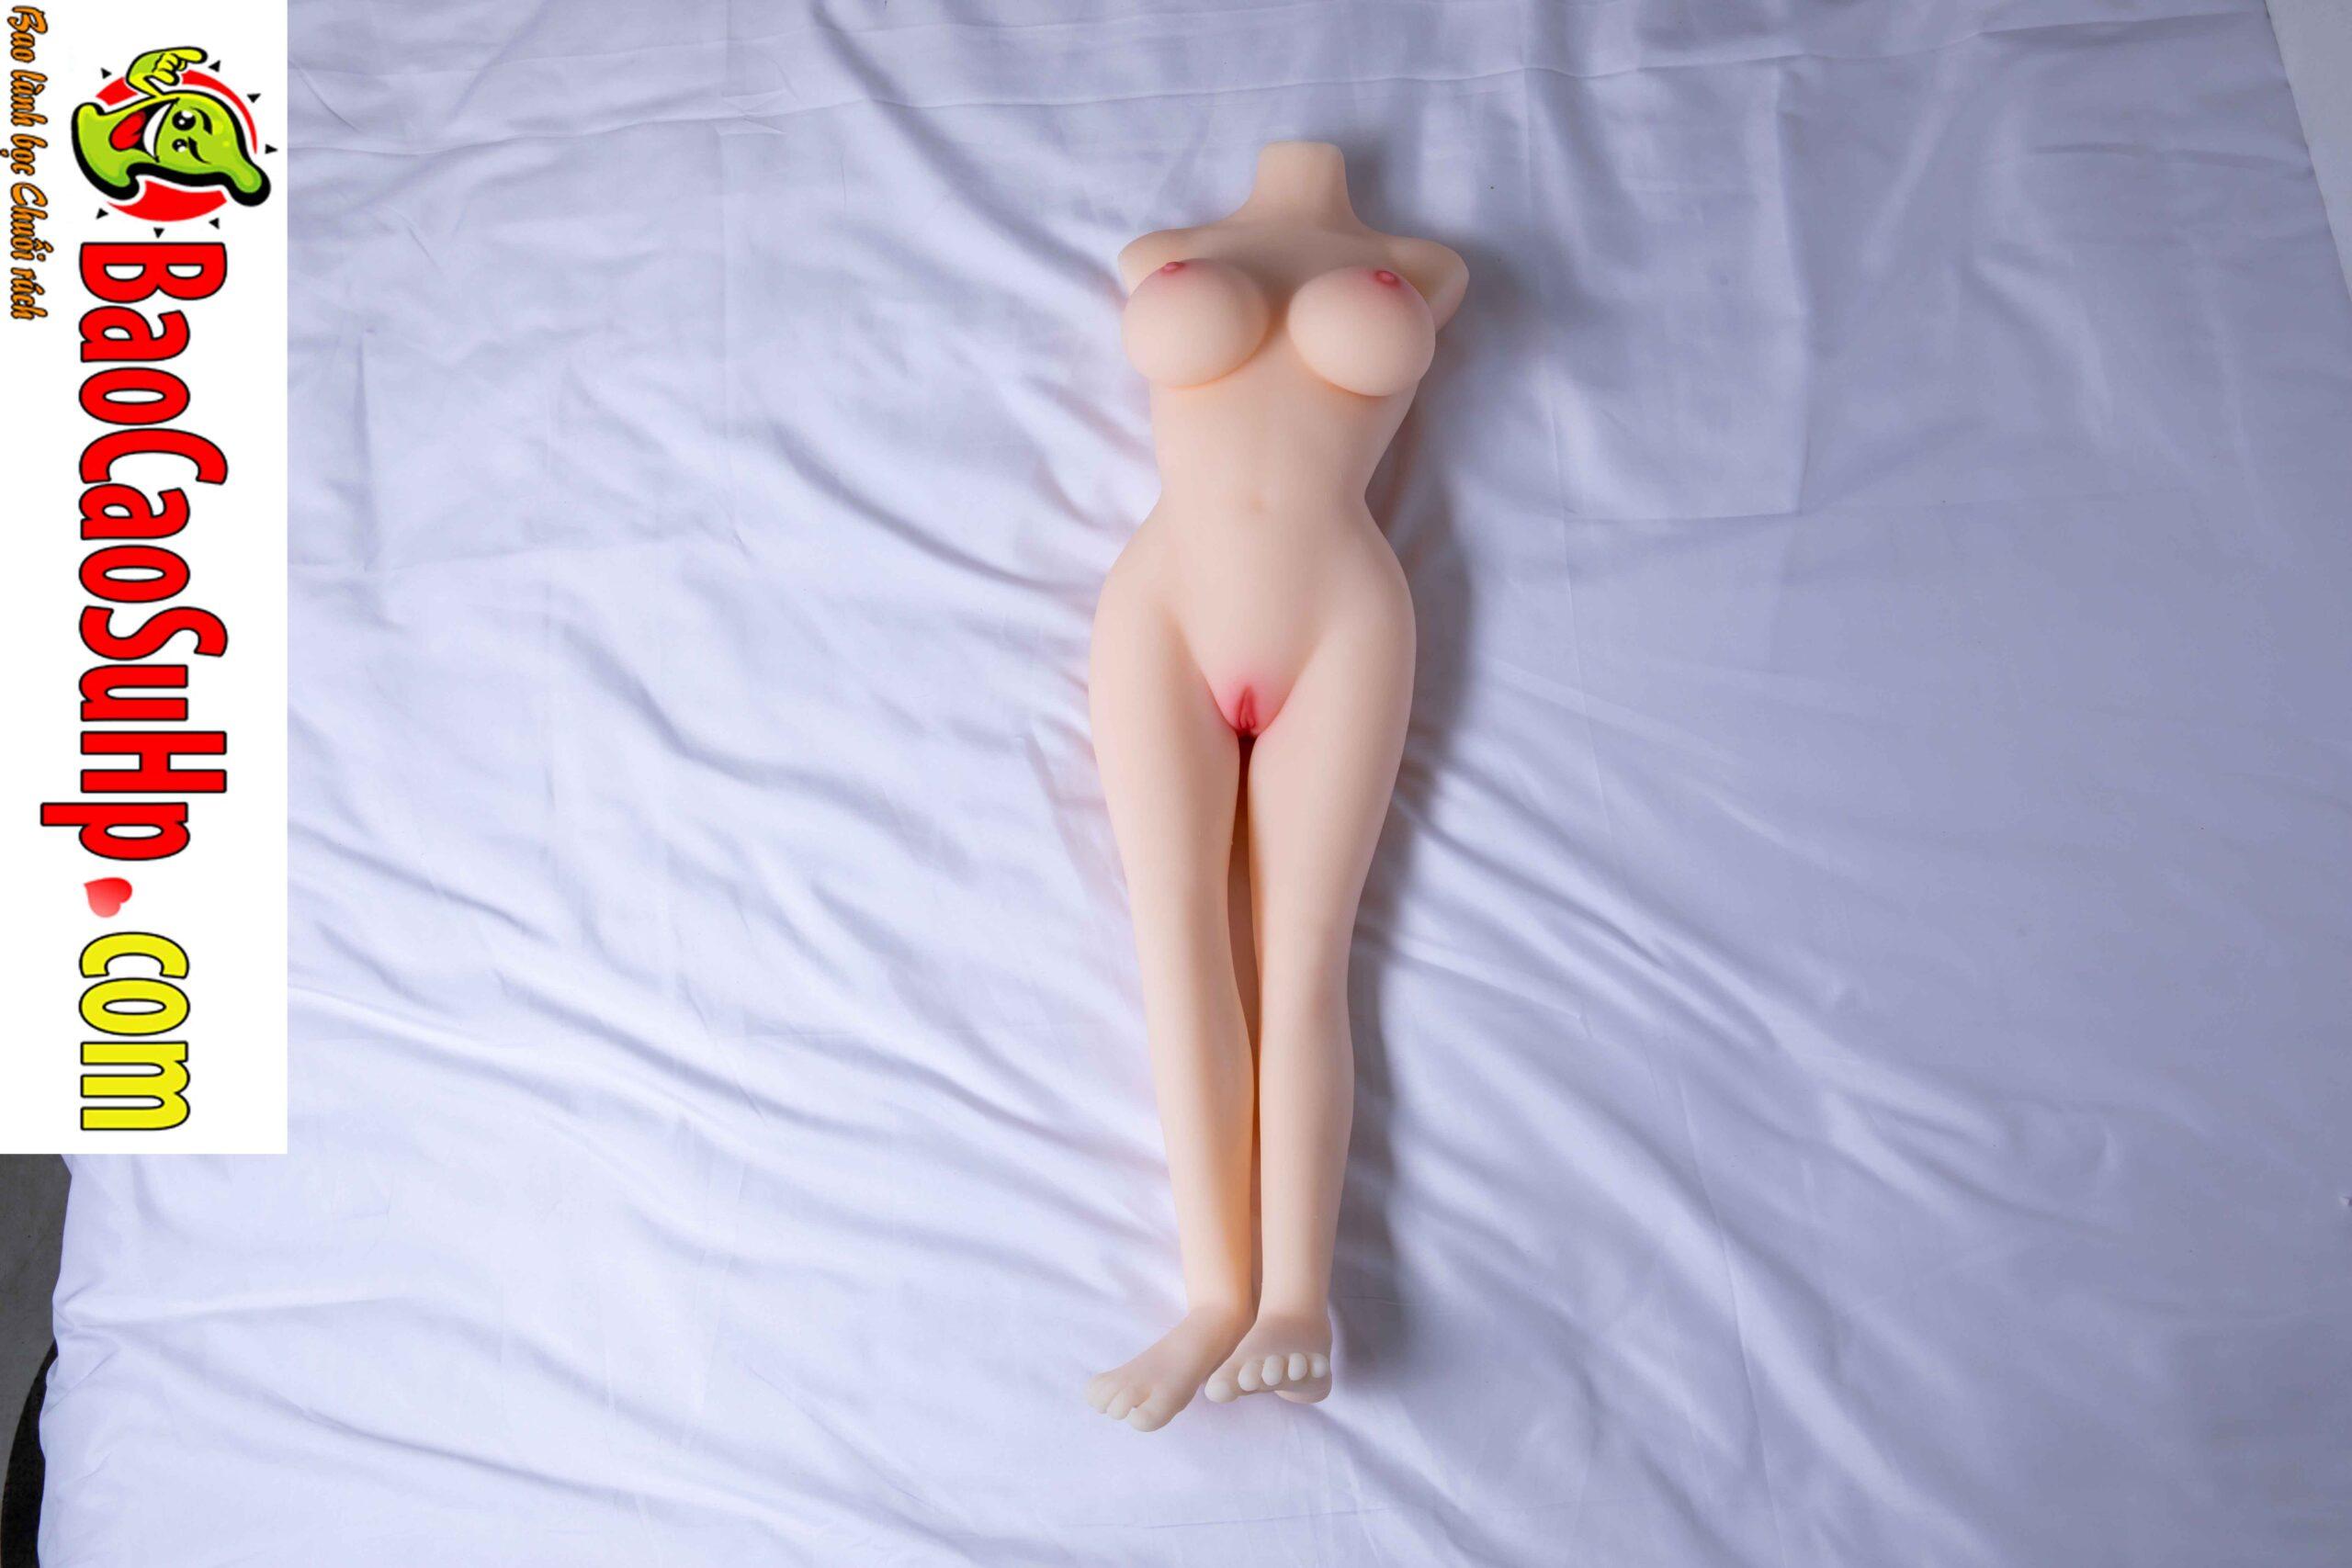 bup be tinh duc Hime Ishihara Kannai 4 scaled - Búp bê bán thân chân dài Hime Ishihara Kannai Nhật Bản